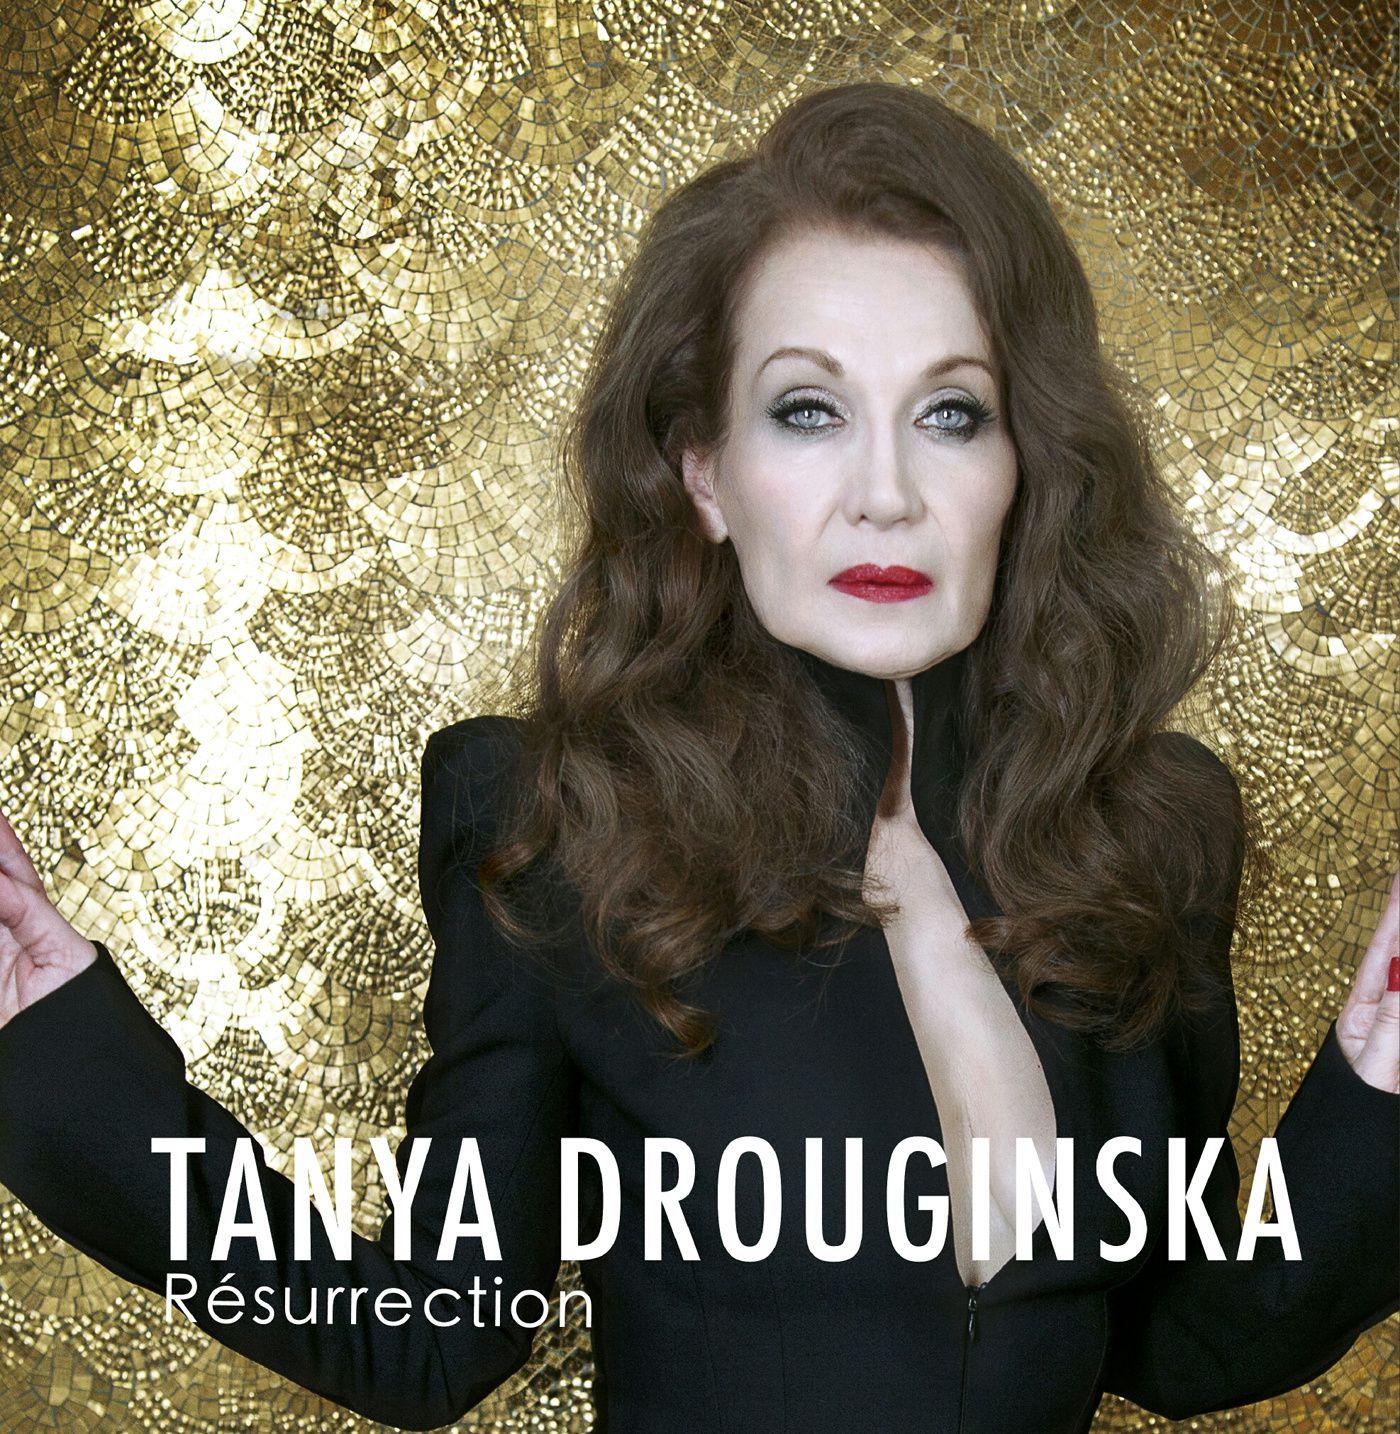 tanya drouginska, la mariée, resurrection